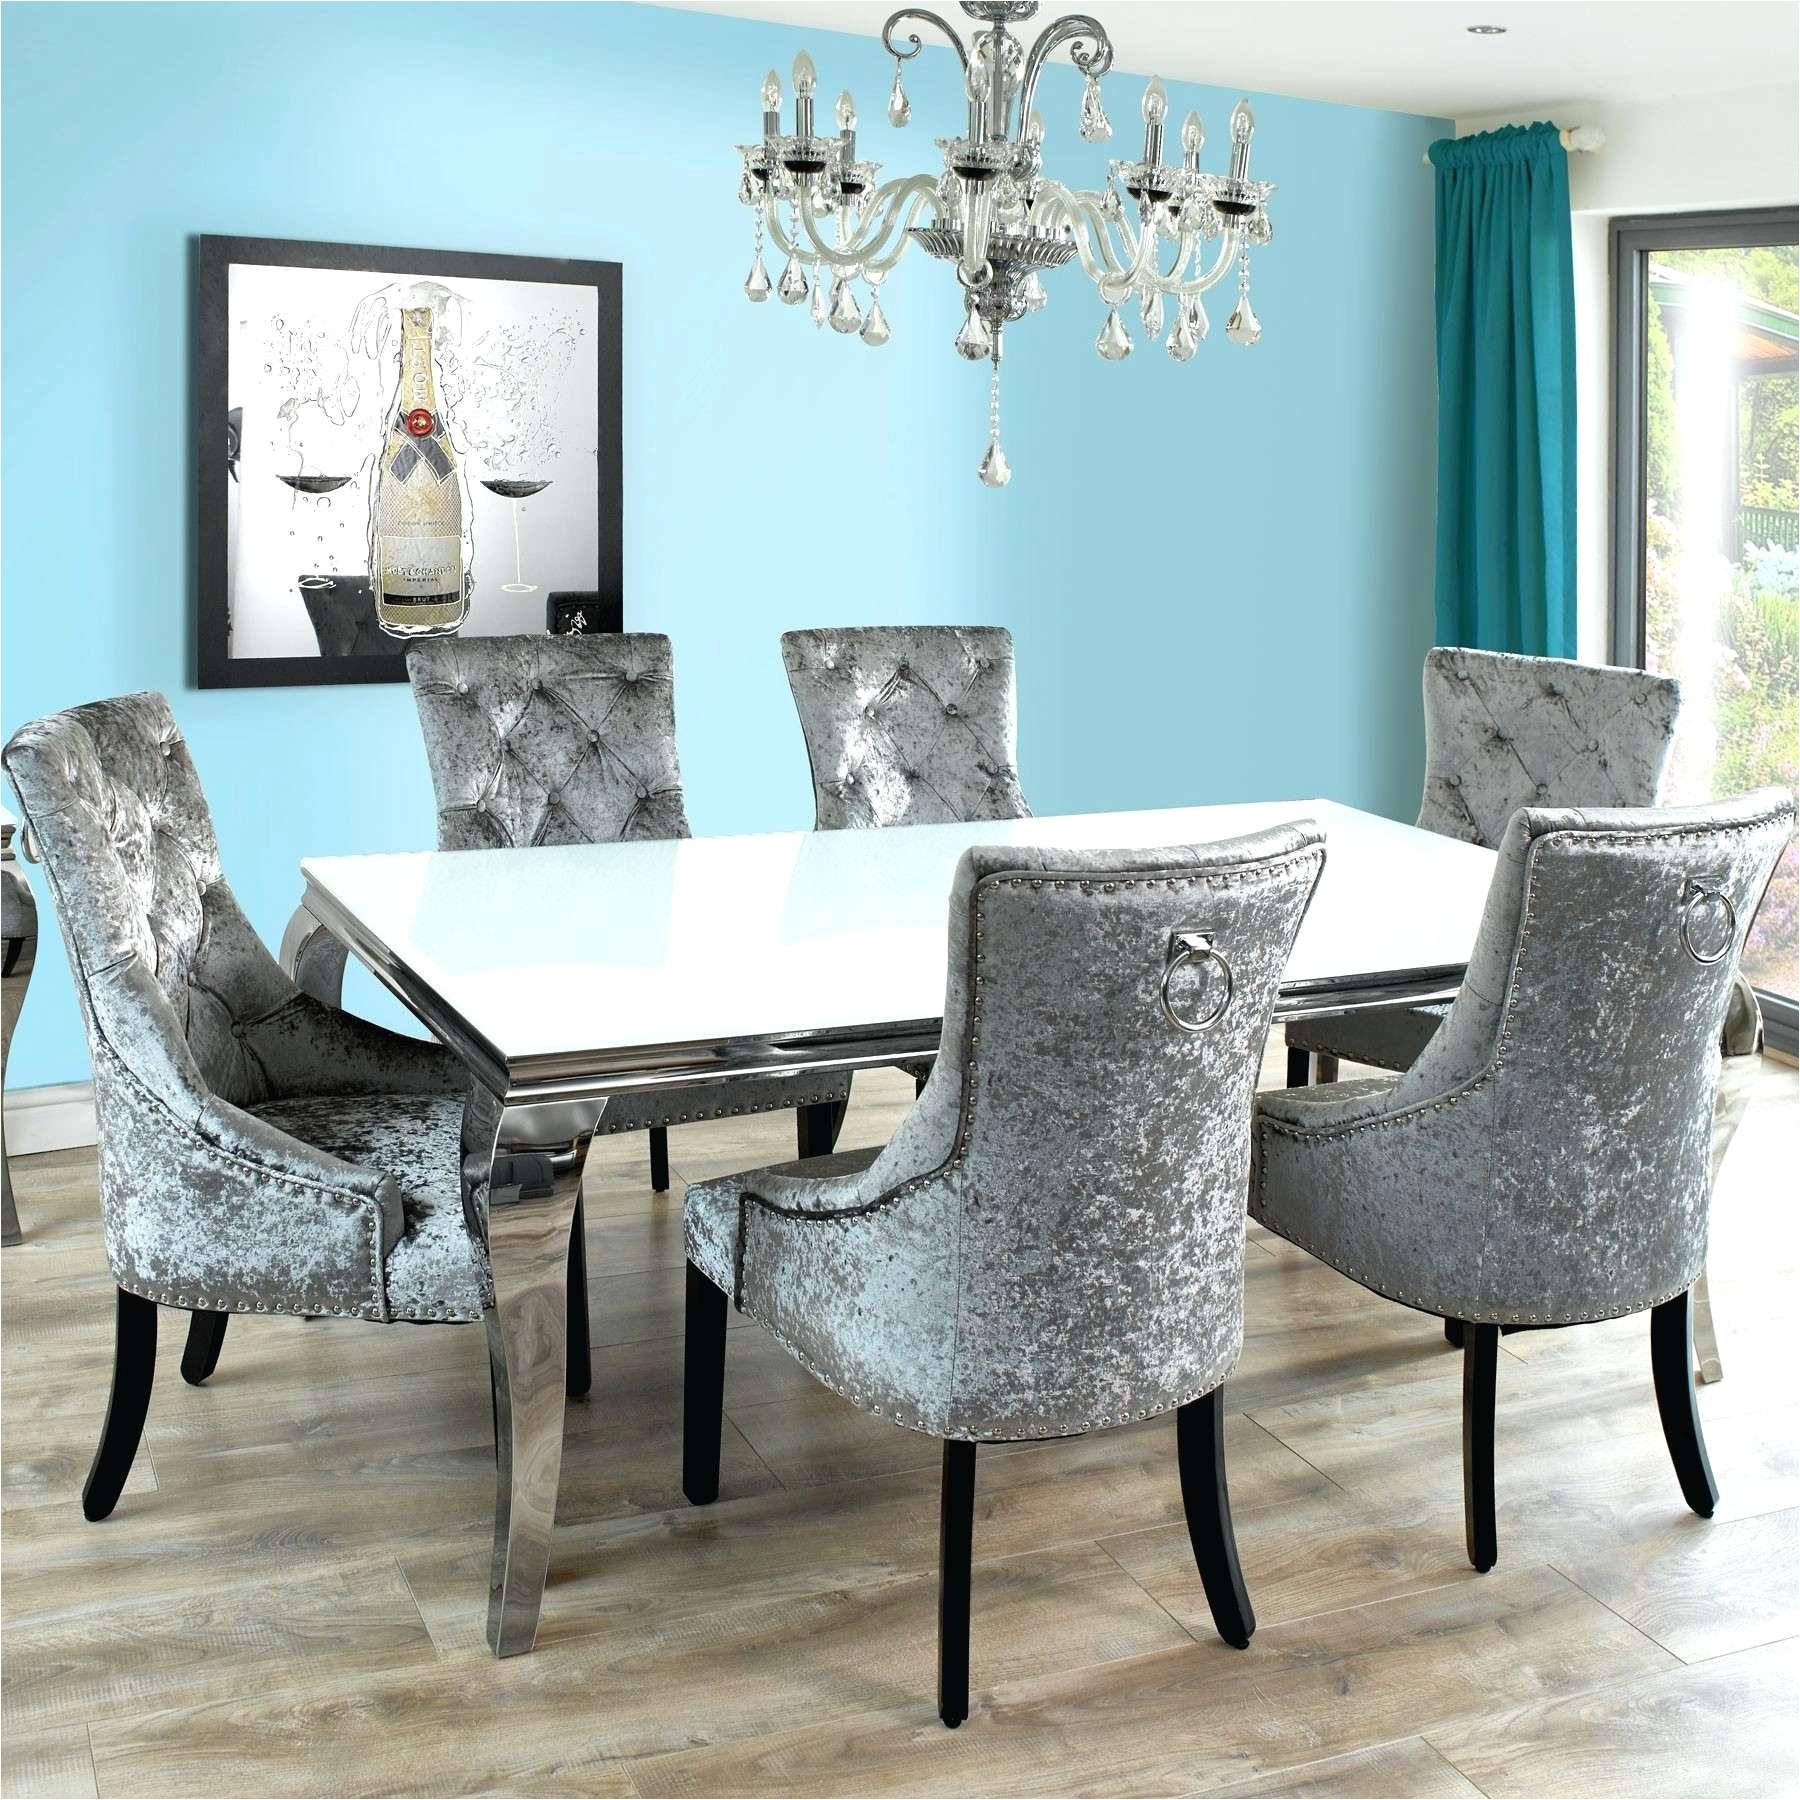 Smart solid Wood Dining Table Set Ideas Od Dining Room Tables and Inside Dining Room Table